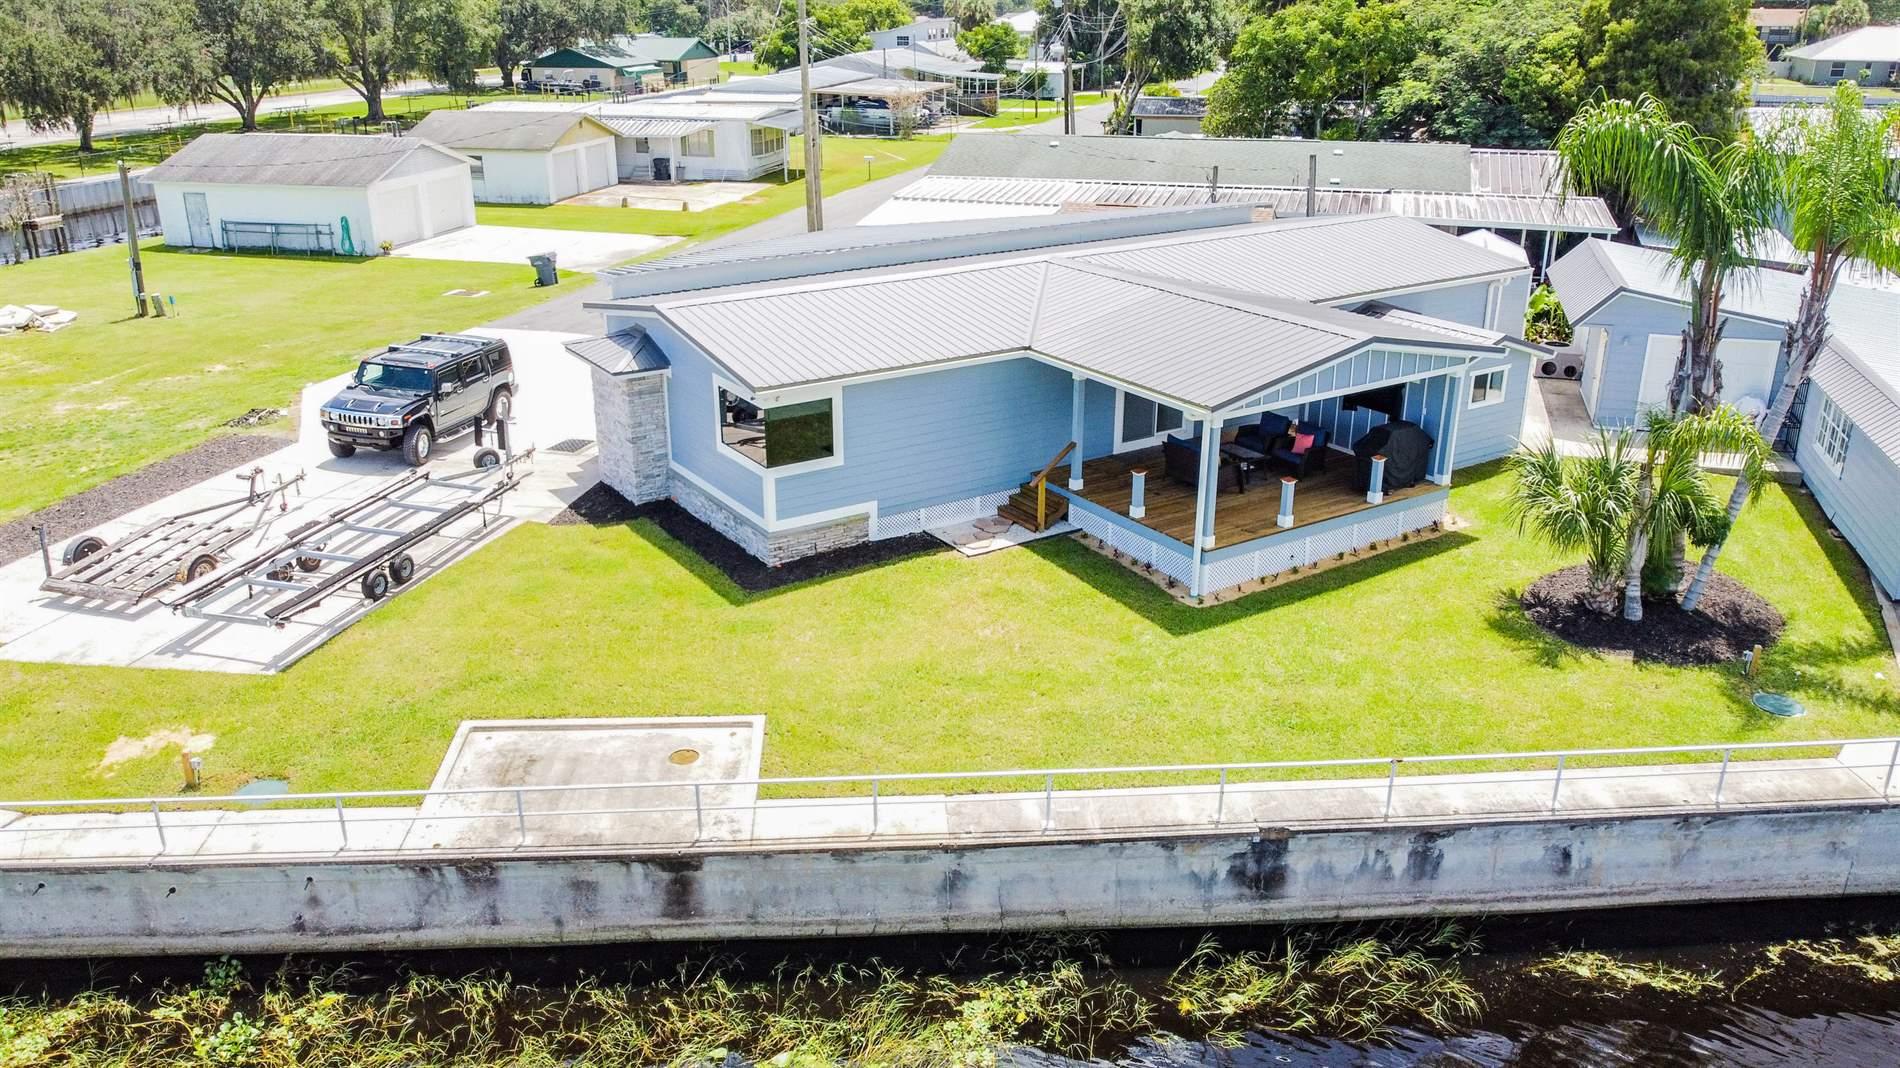 193 Buoy St, Haines City, FL 33844